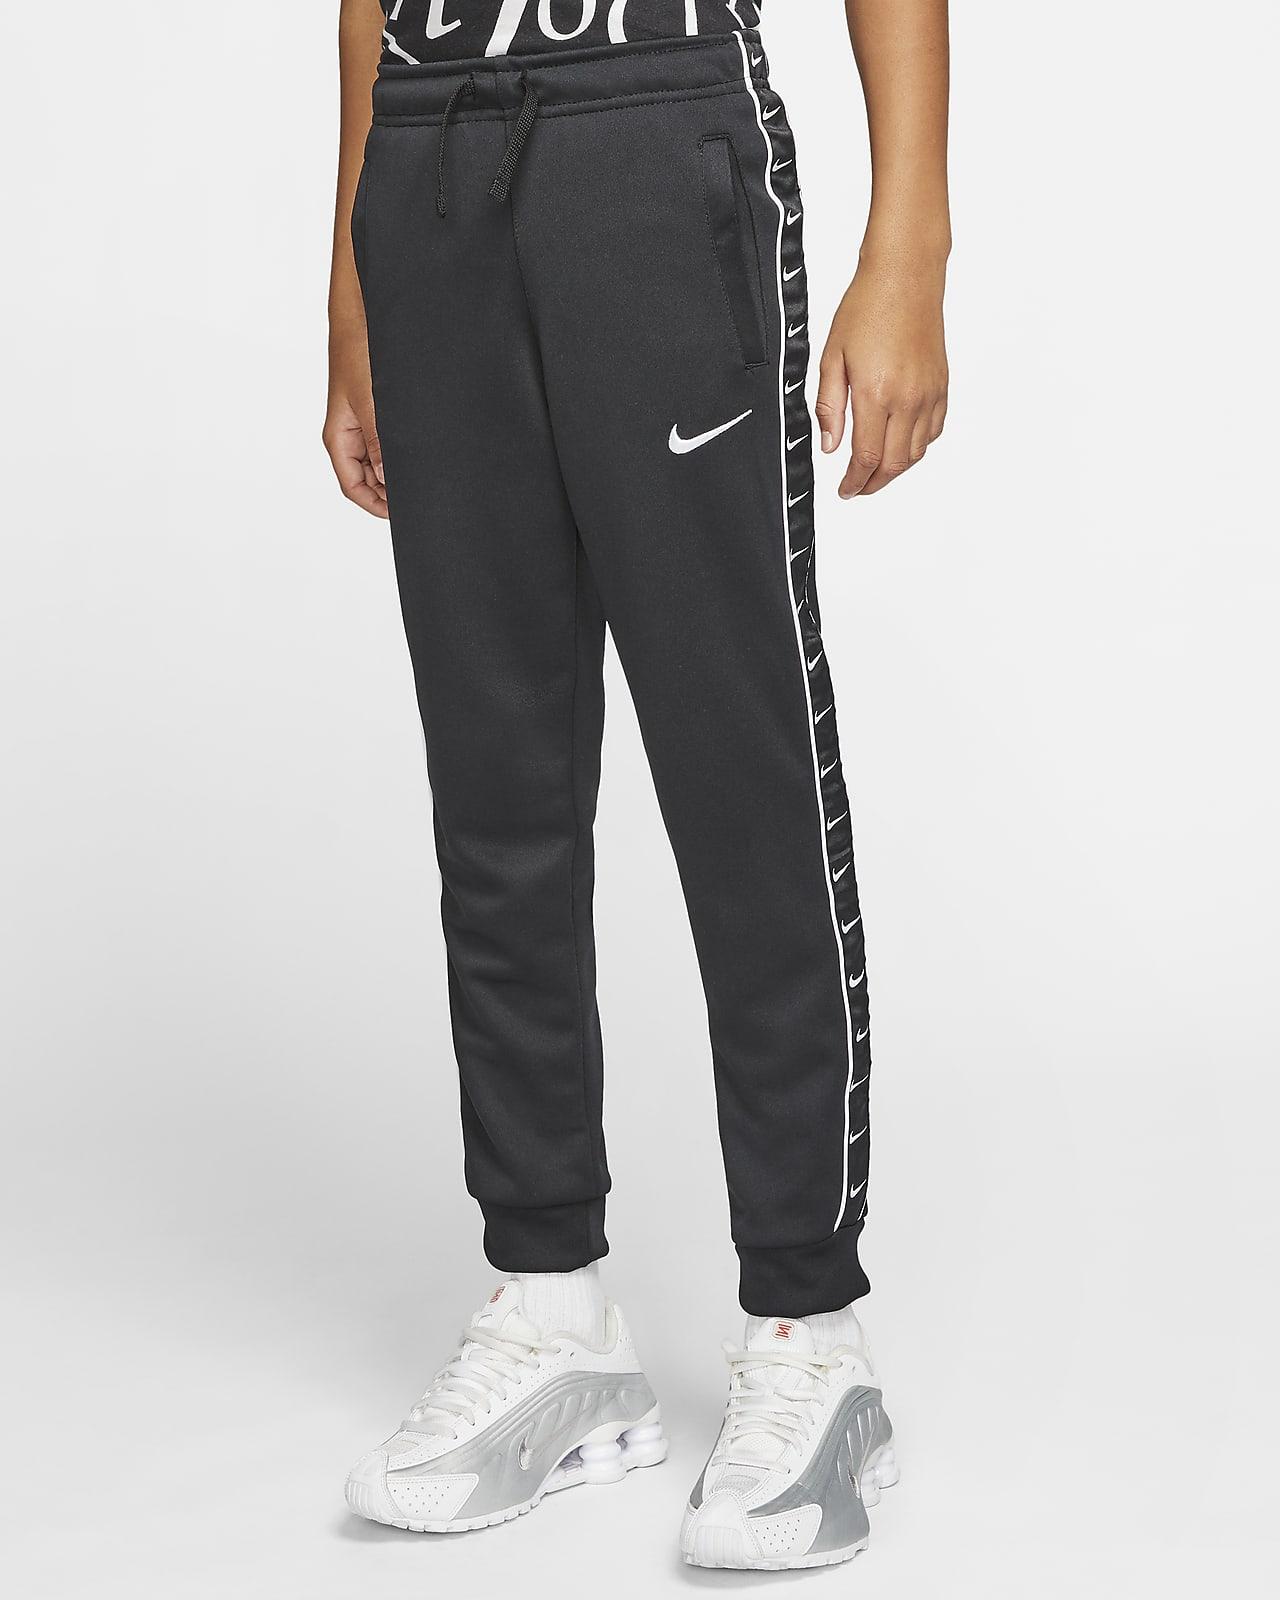 Nike Sportswear Swoosh Joggingbroek voor kids